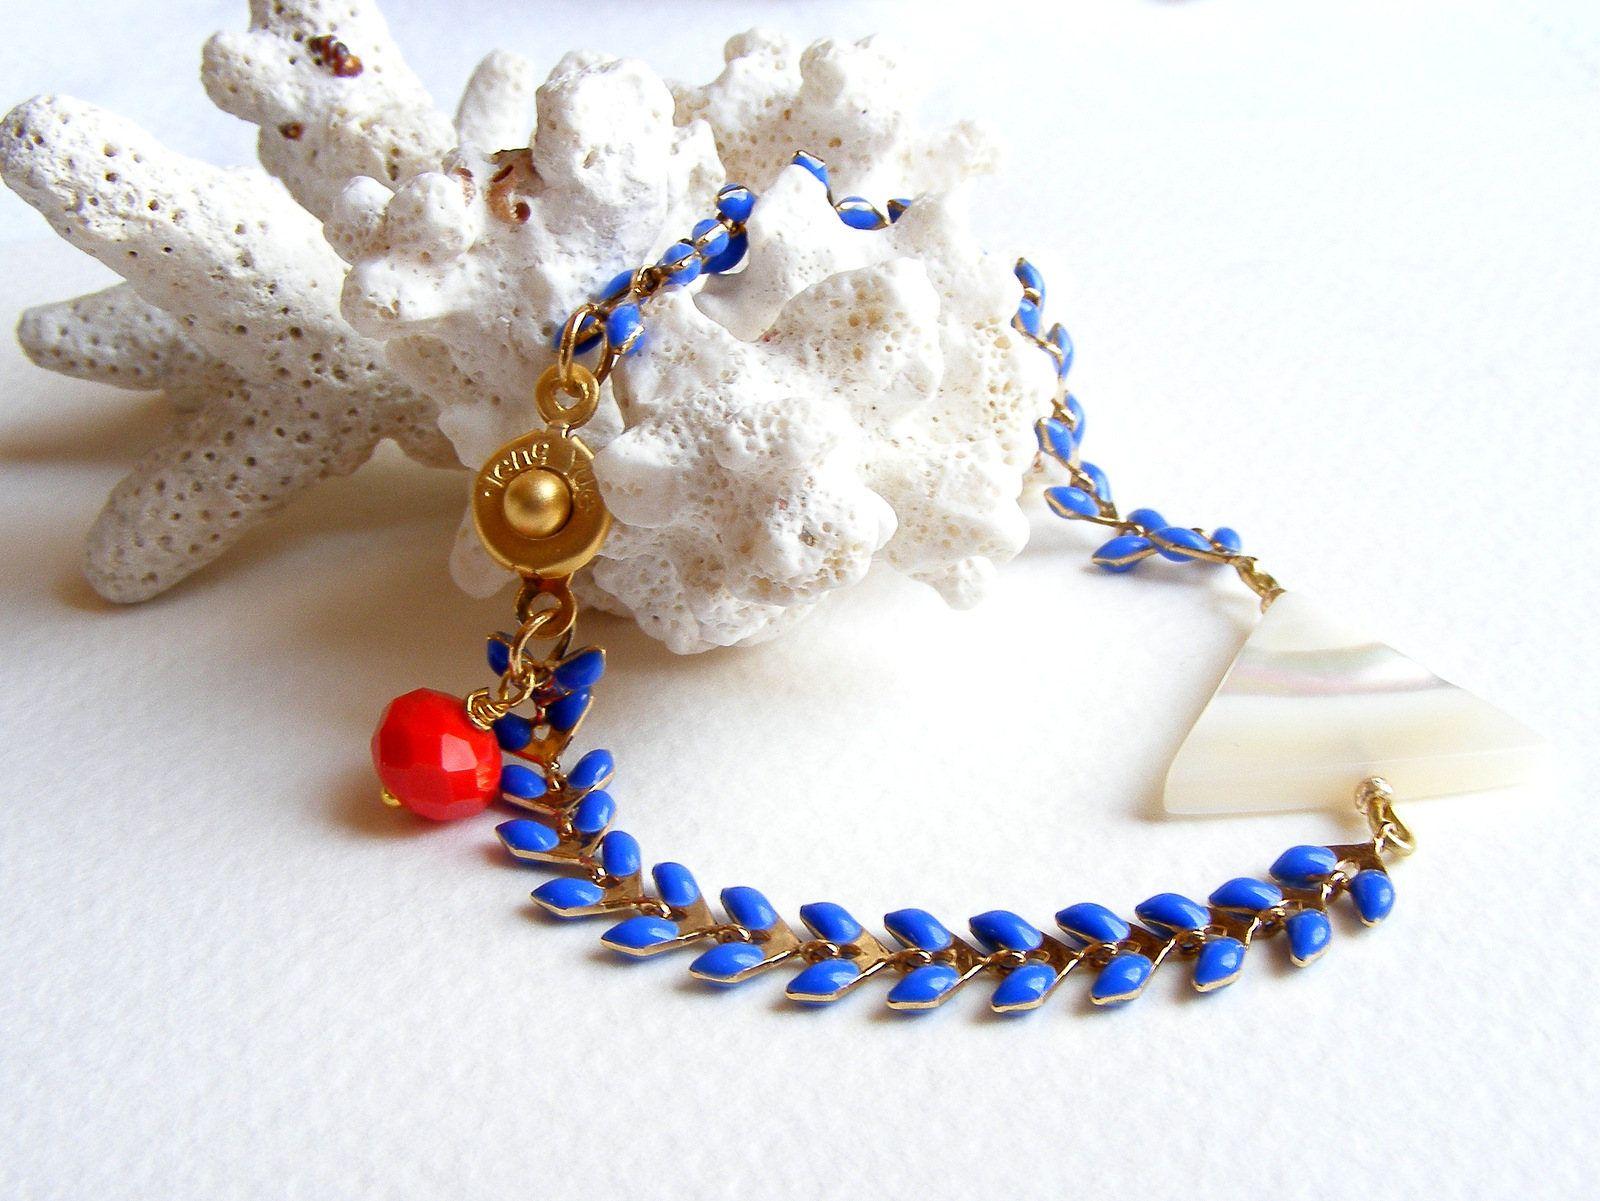 bijoux fantaisie bleu blanc rouge